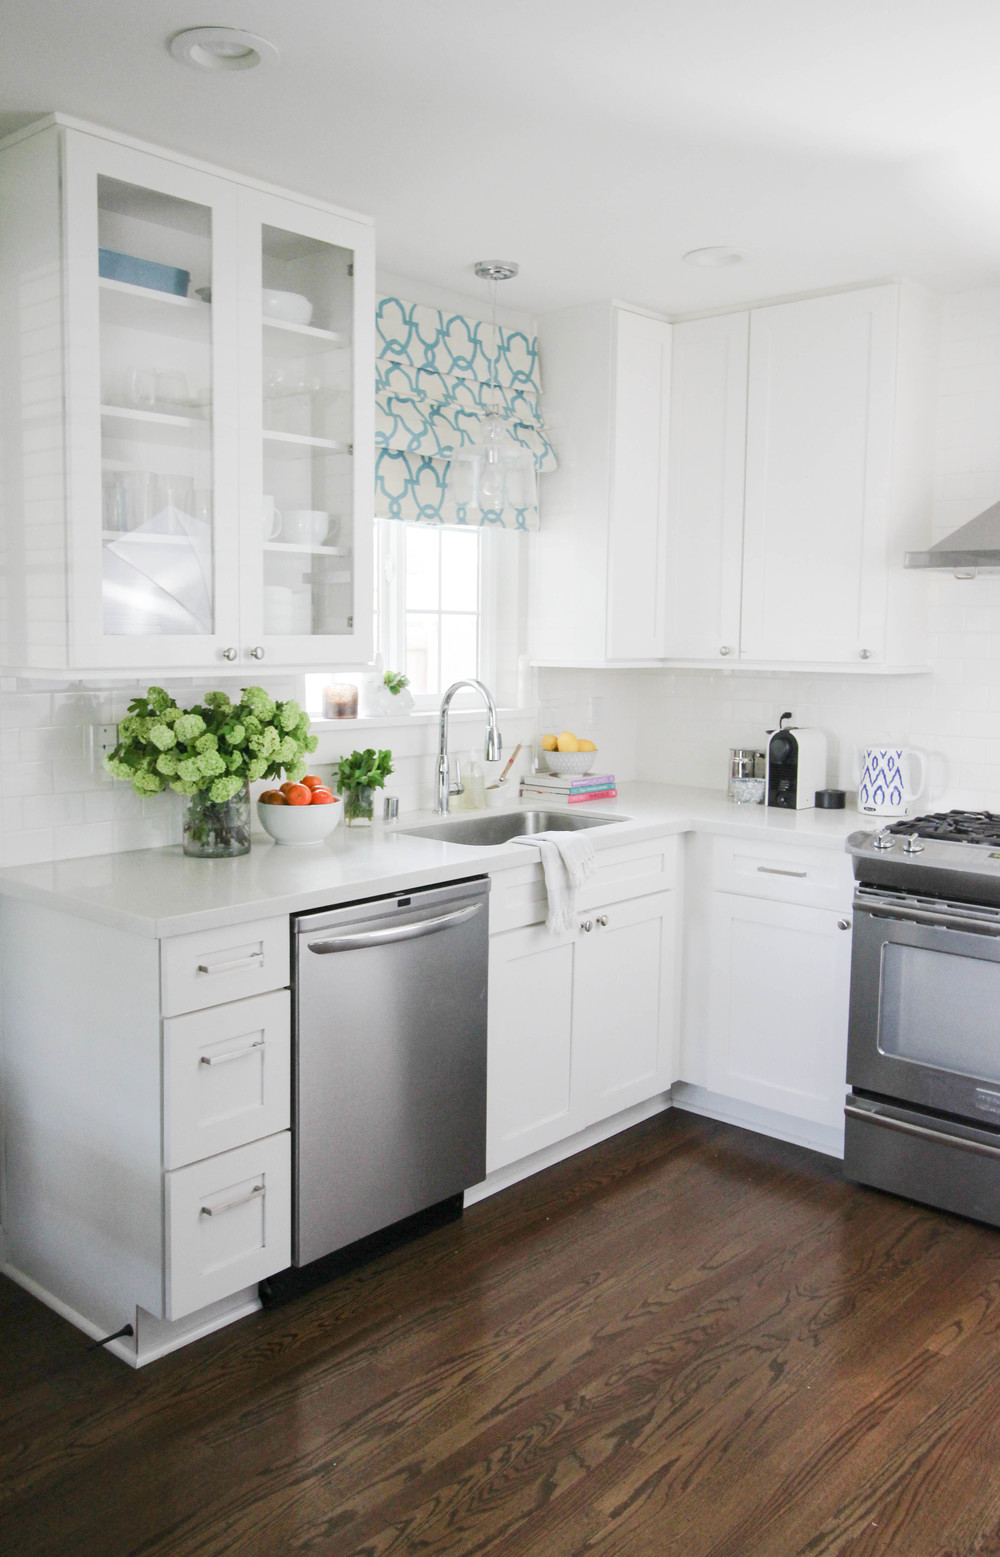 Home Tour My Kitchen Katrina Blair Interior Design Small Home Style Modern Livingkatrina Blair